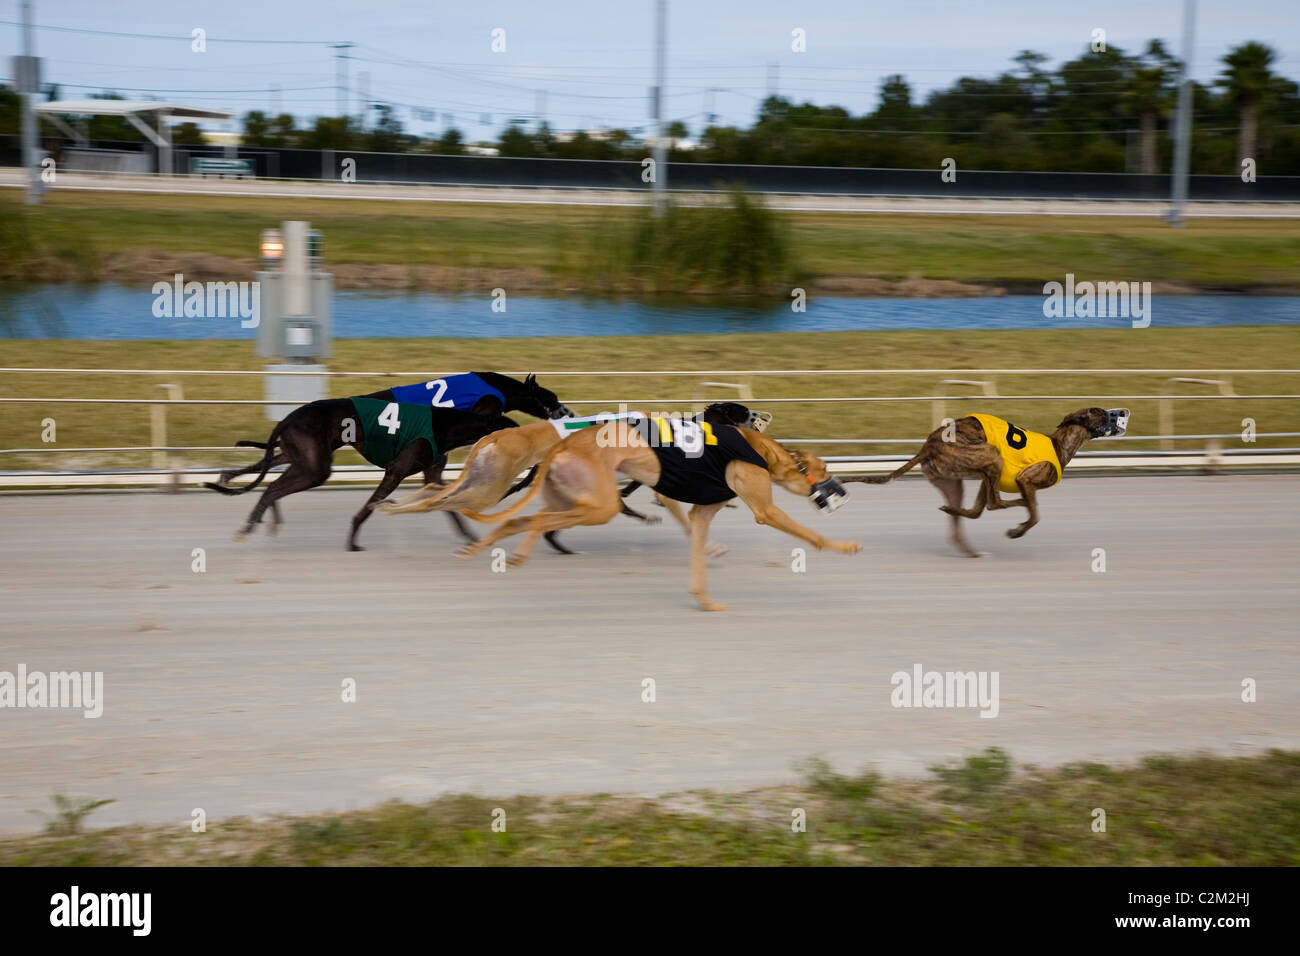 Daytona Beach Kennel Club Daytona Stock Photos Daytona Beach